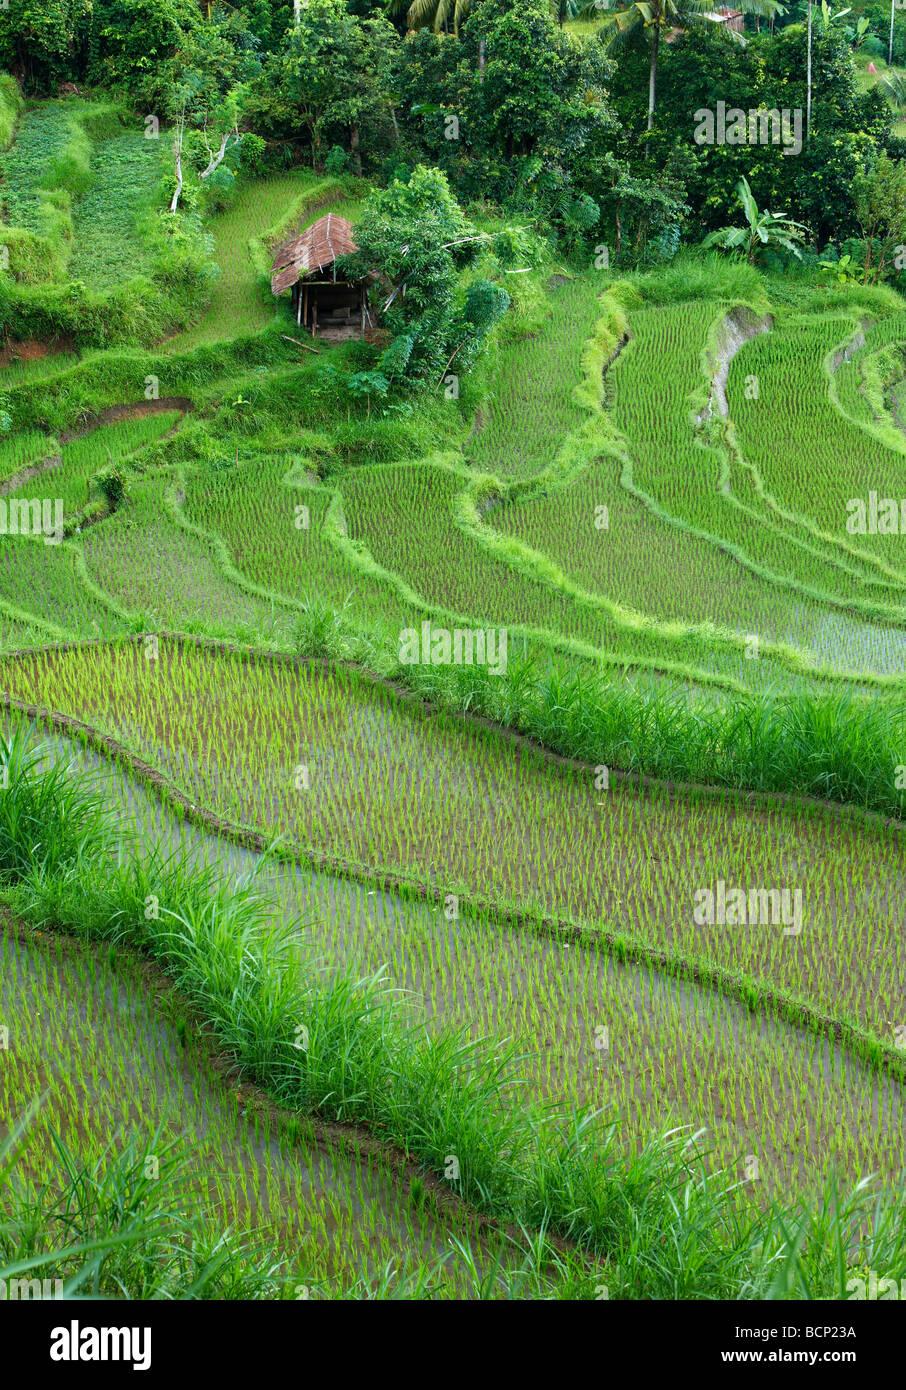 I campi di riso terrazzati, vicino Tirtagangga, Bali, Indonesia Immagini Stock